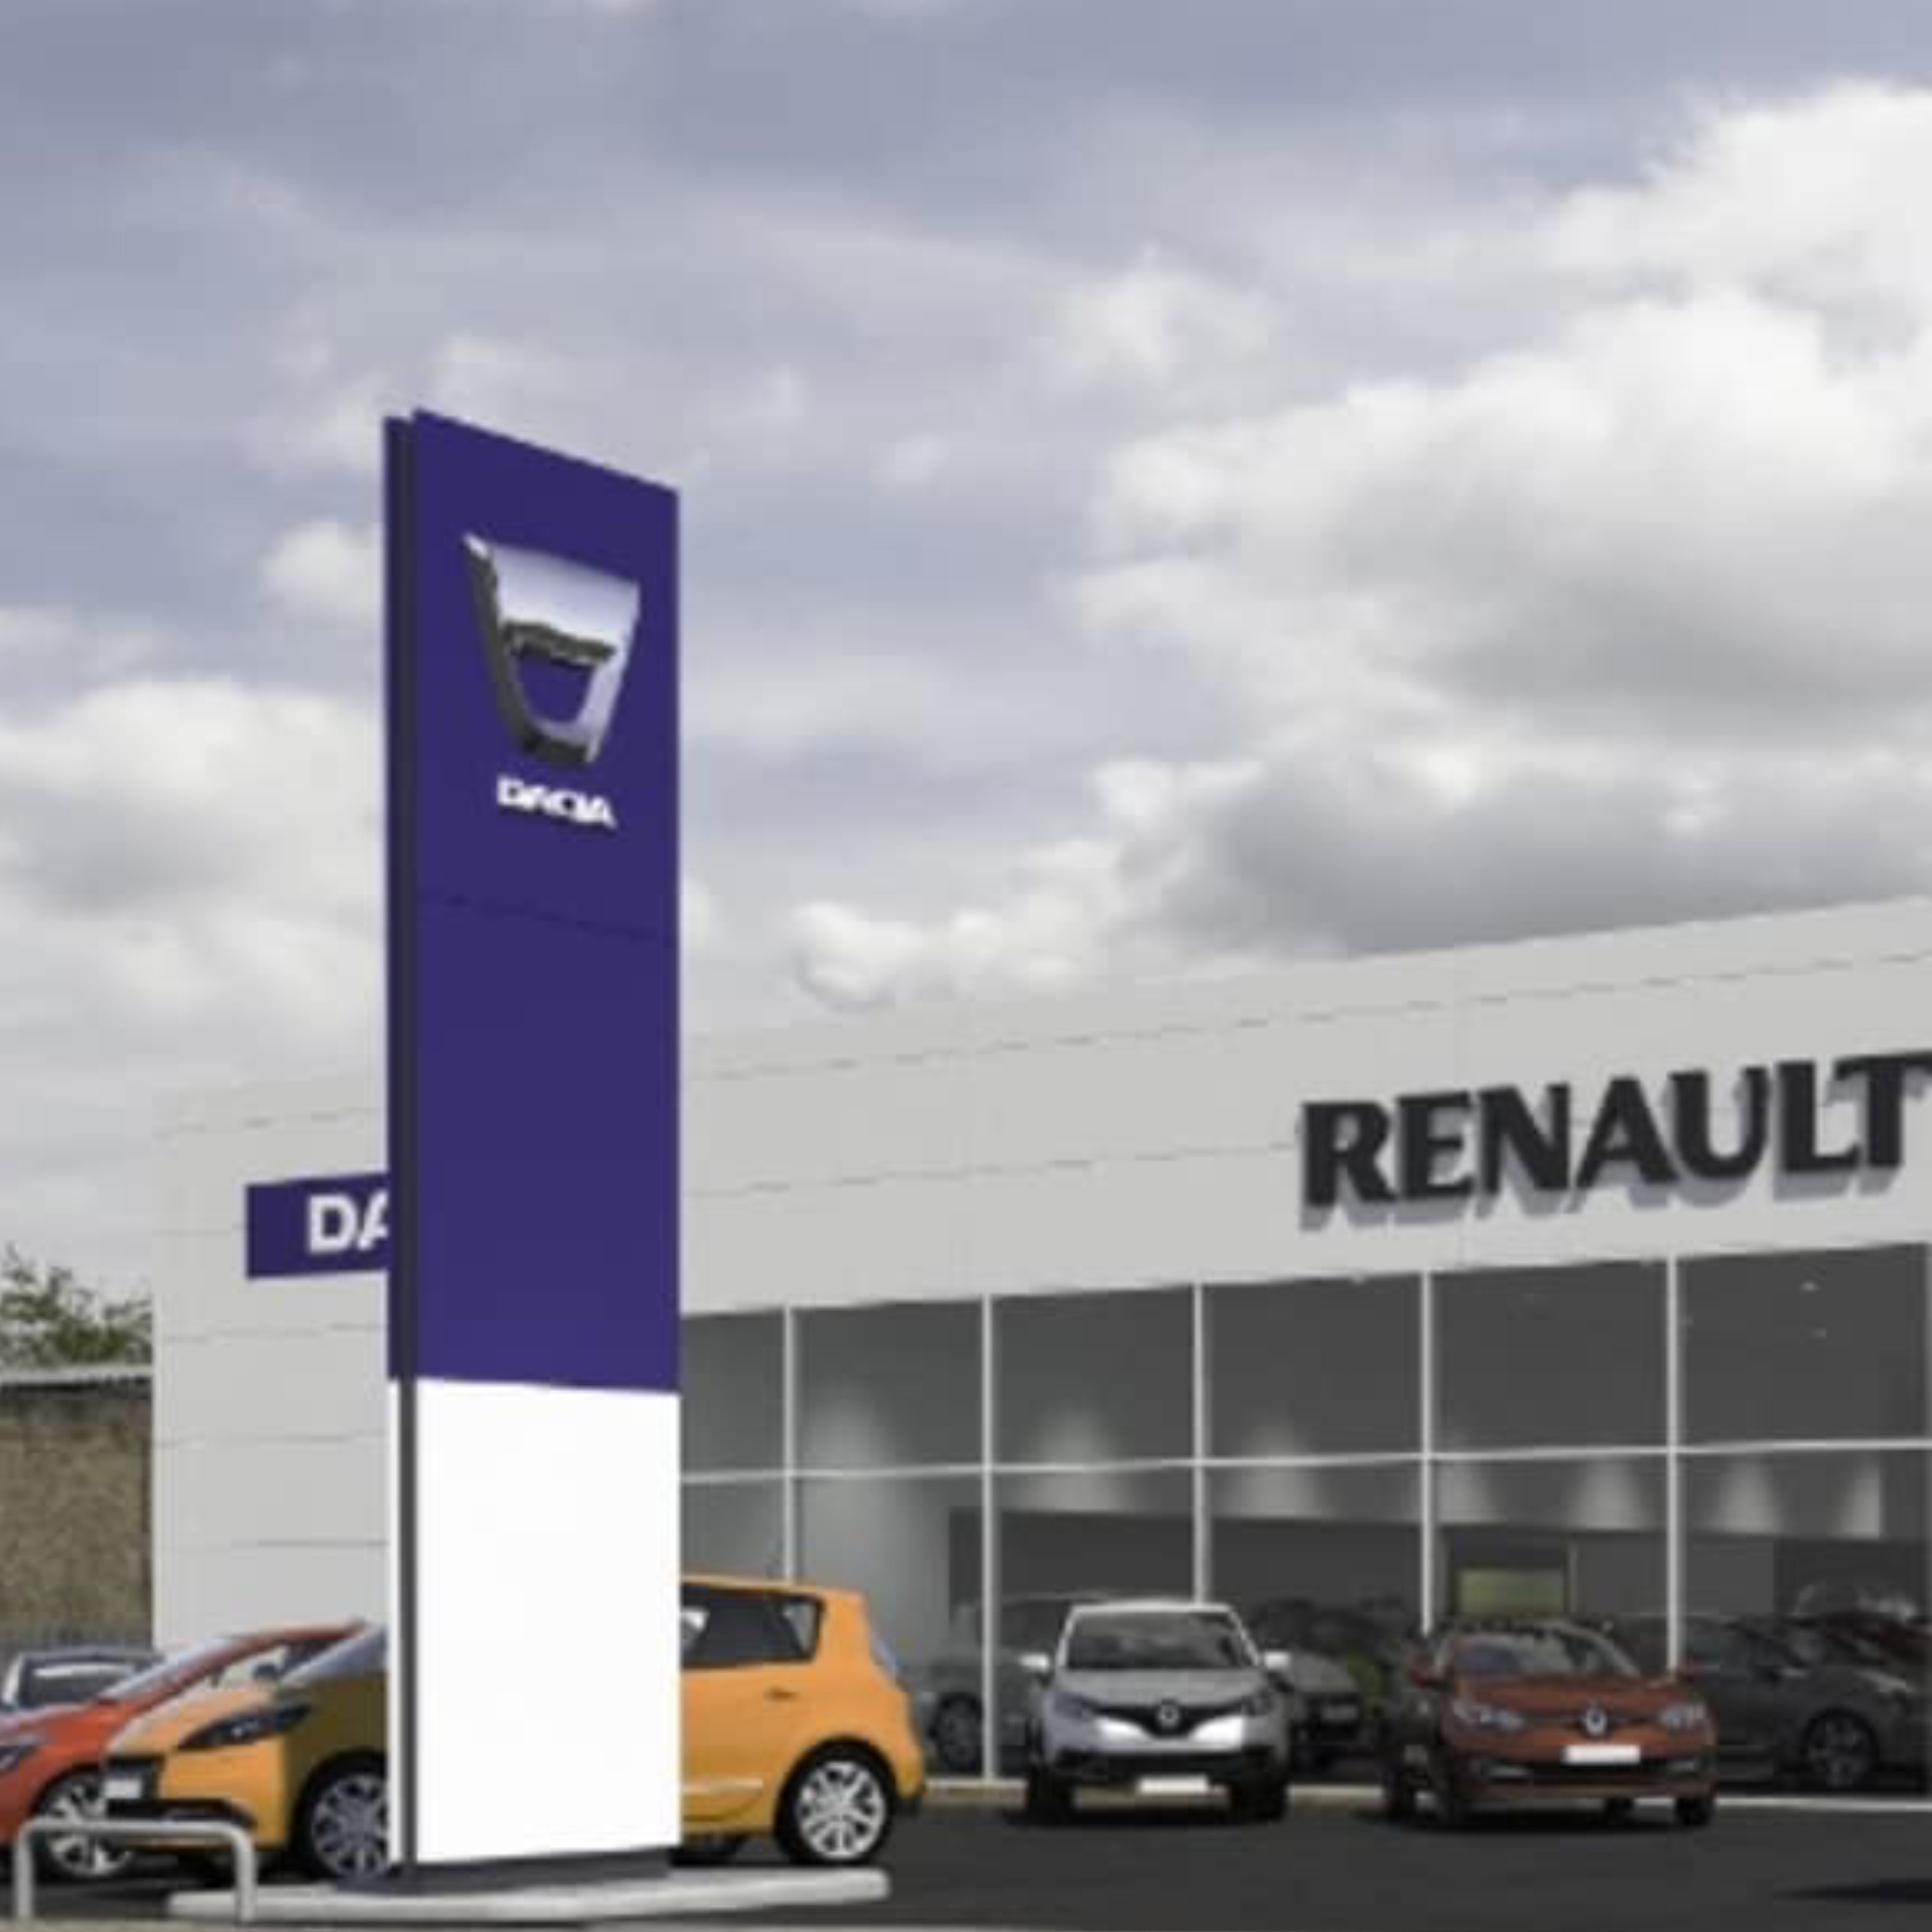 Renault / Dacia Showroom Chelmsford - 1